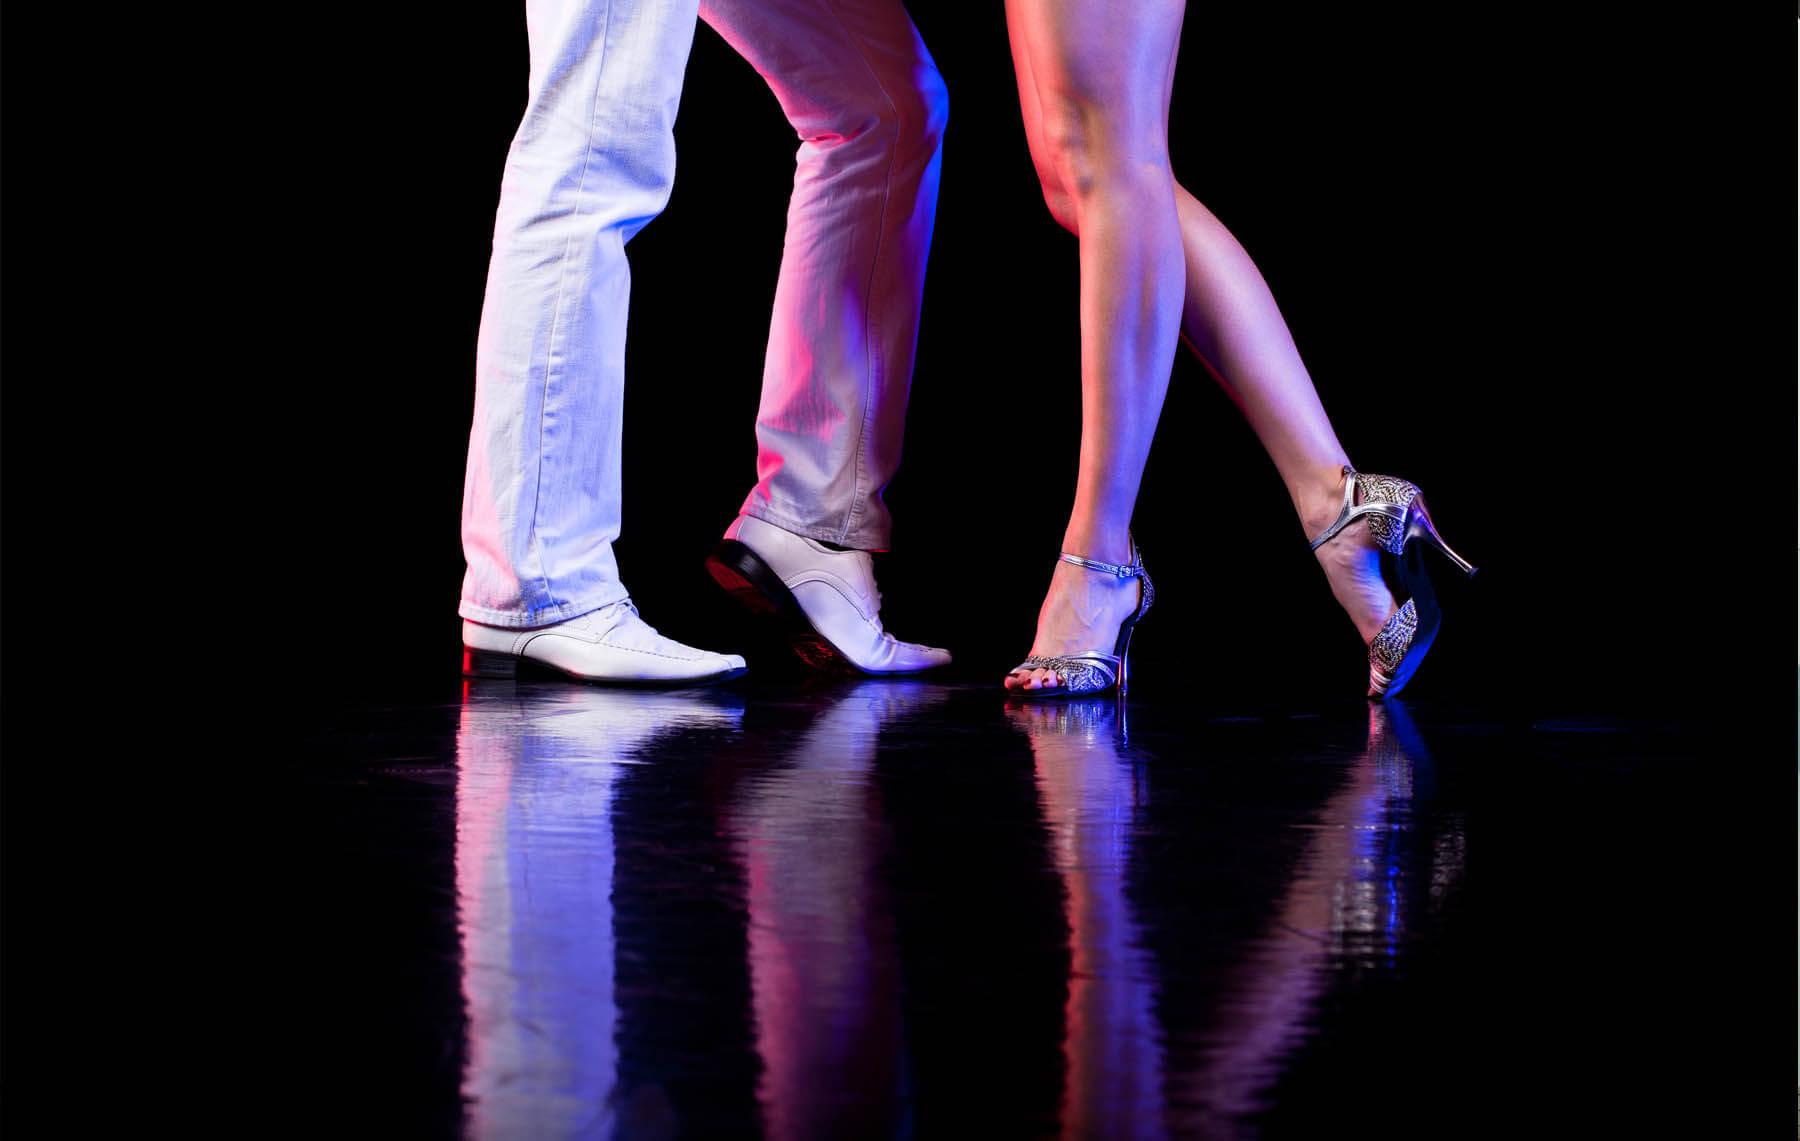 Image newsfeed Apprenez à danser avec Mickael Marques